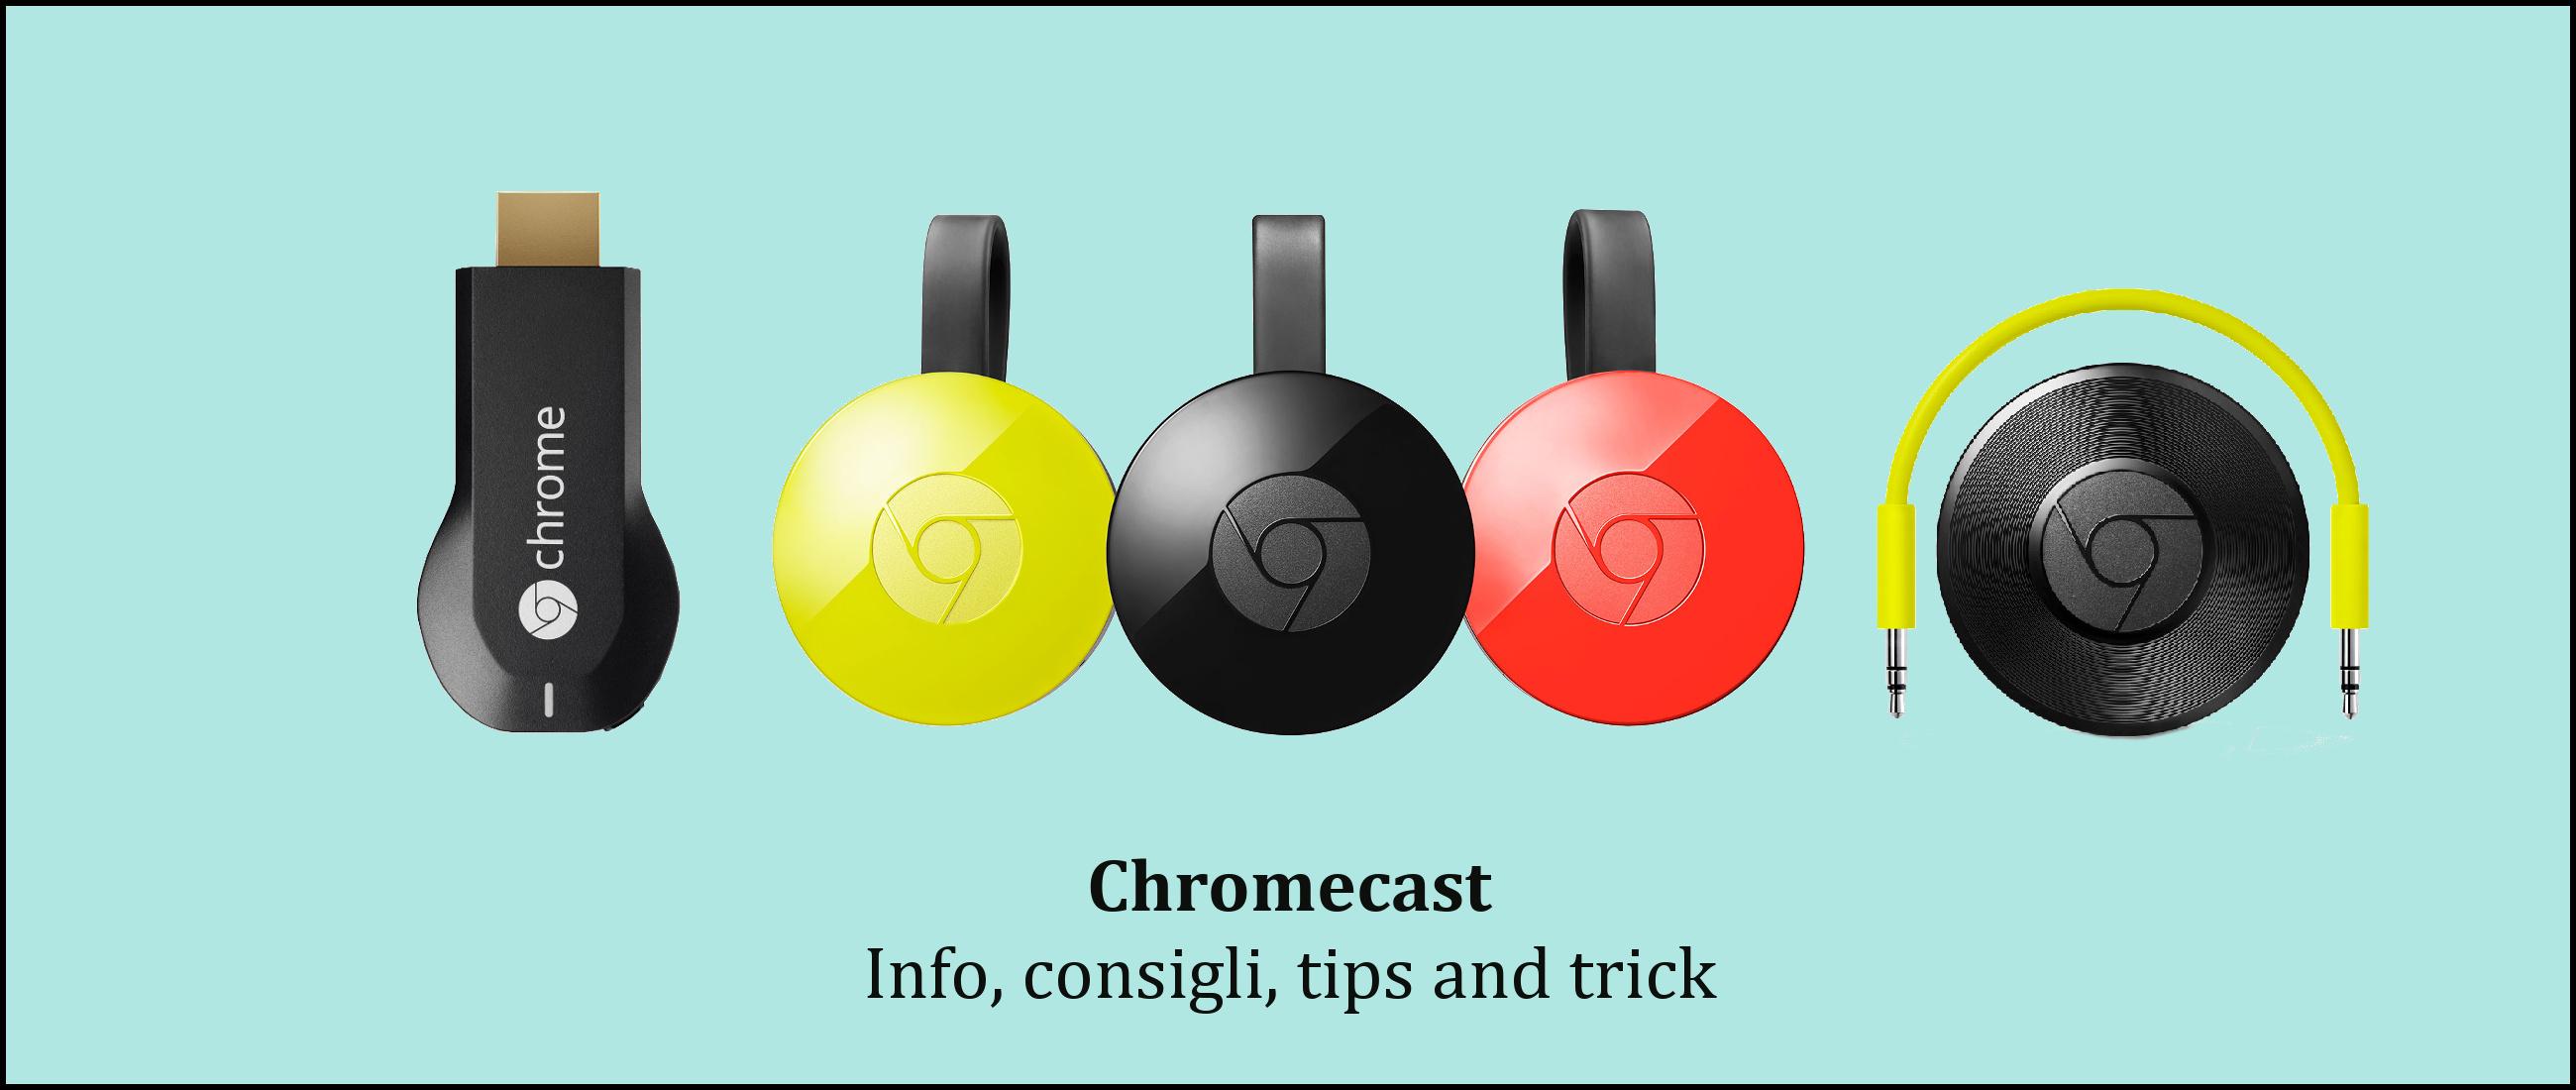 Chromecast%5BFINAL%5D.jpg